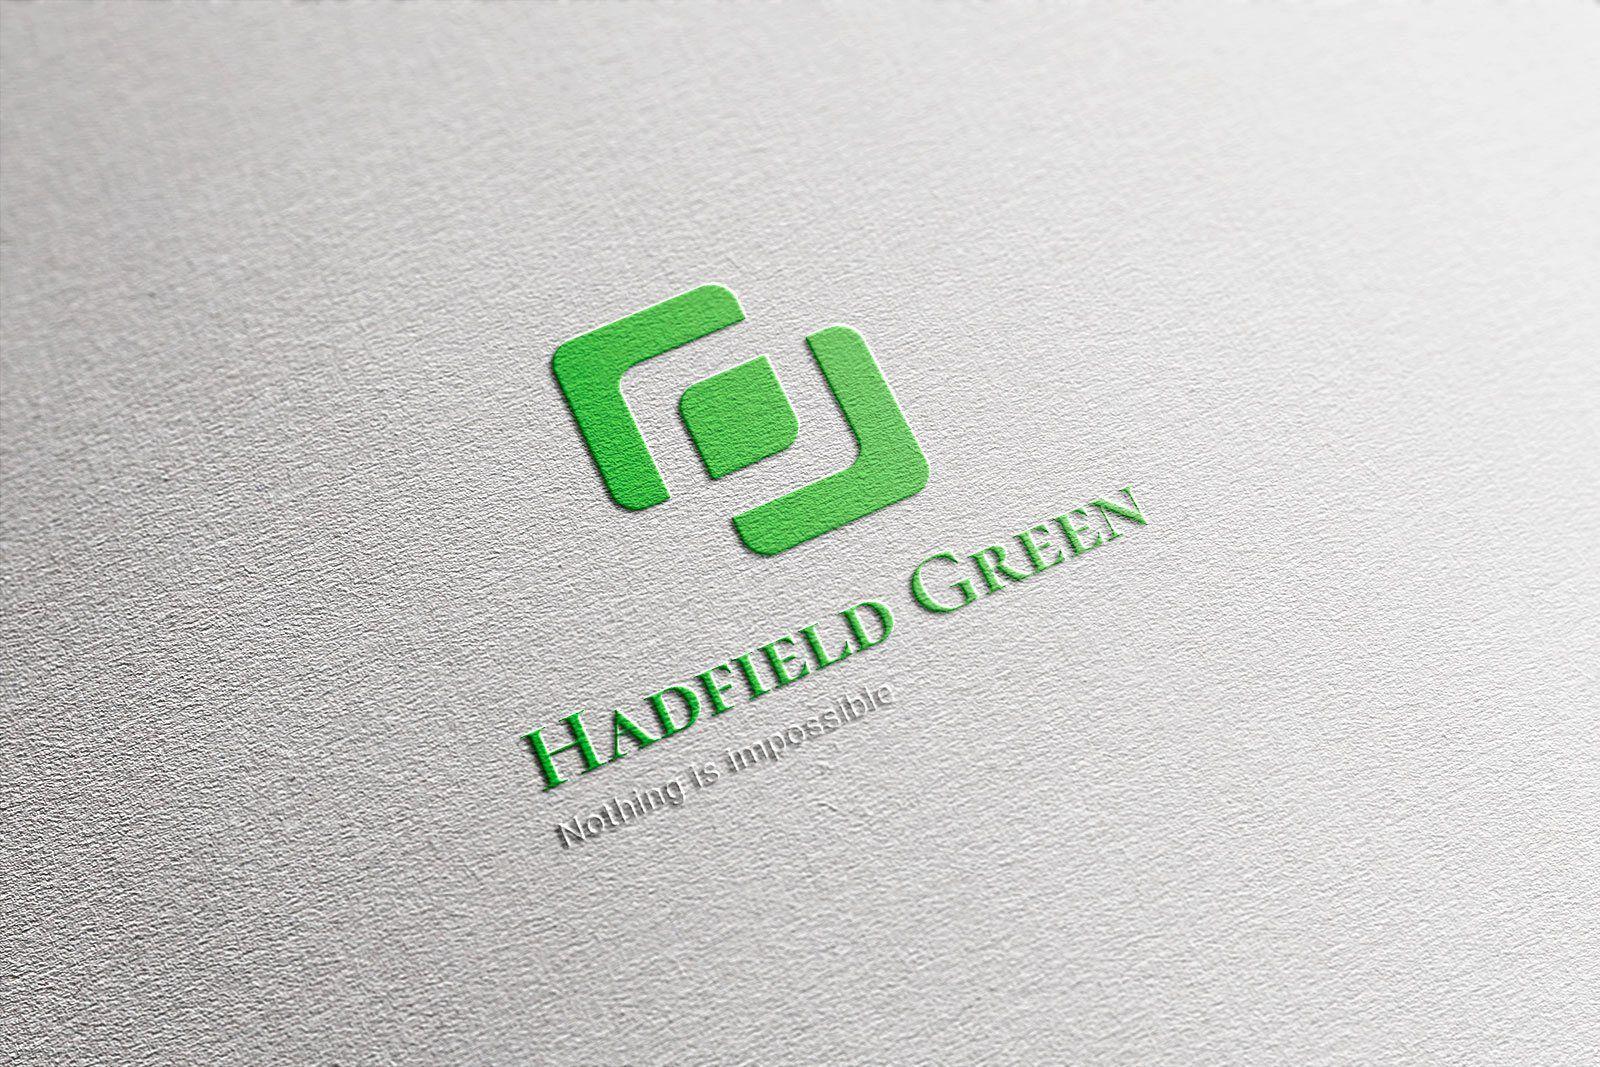 Hadfield Green